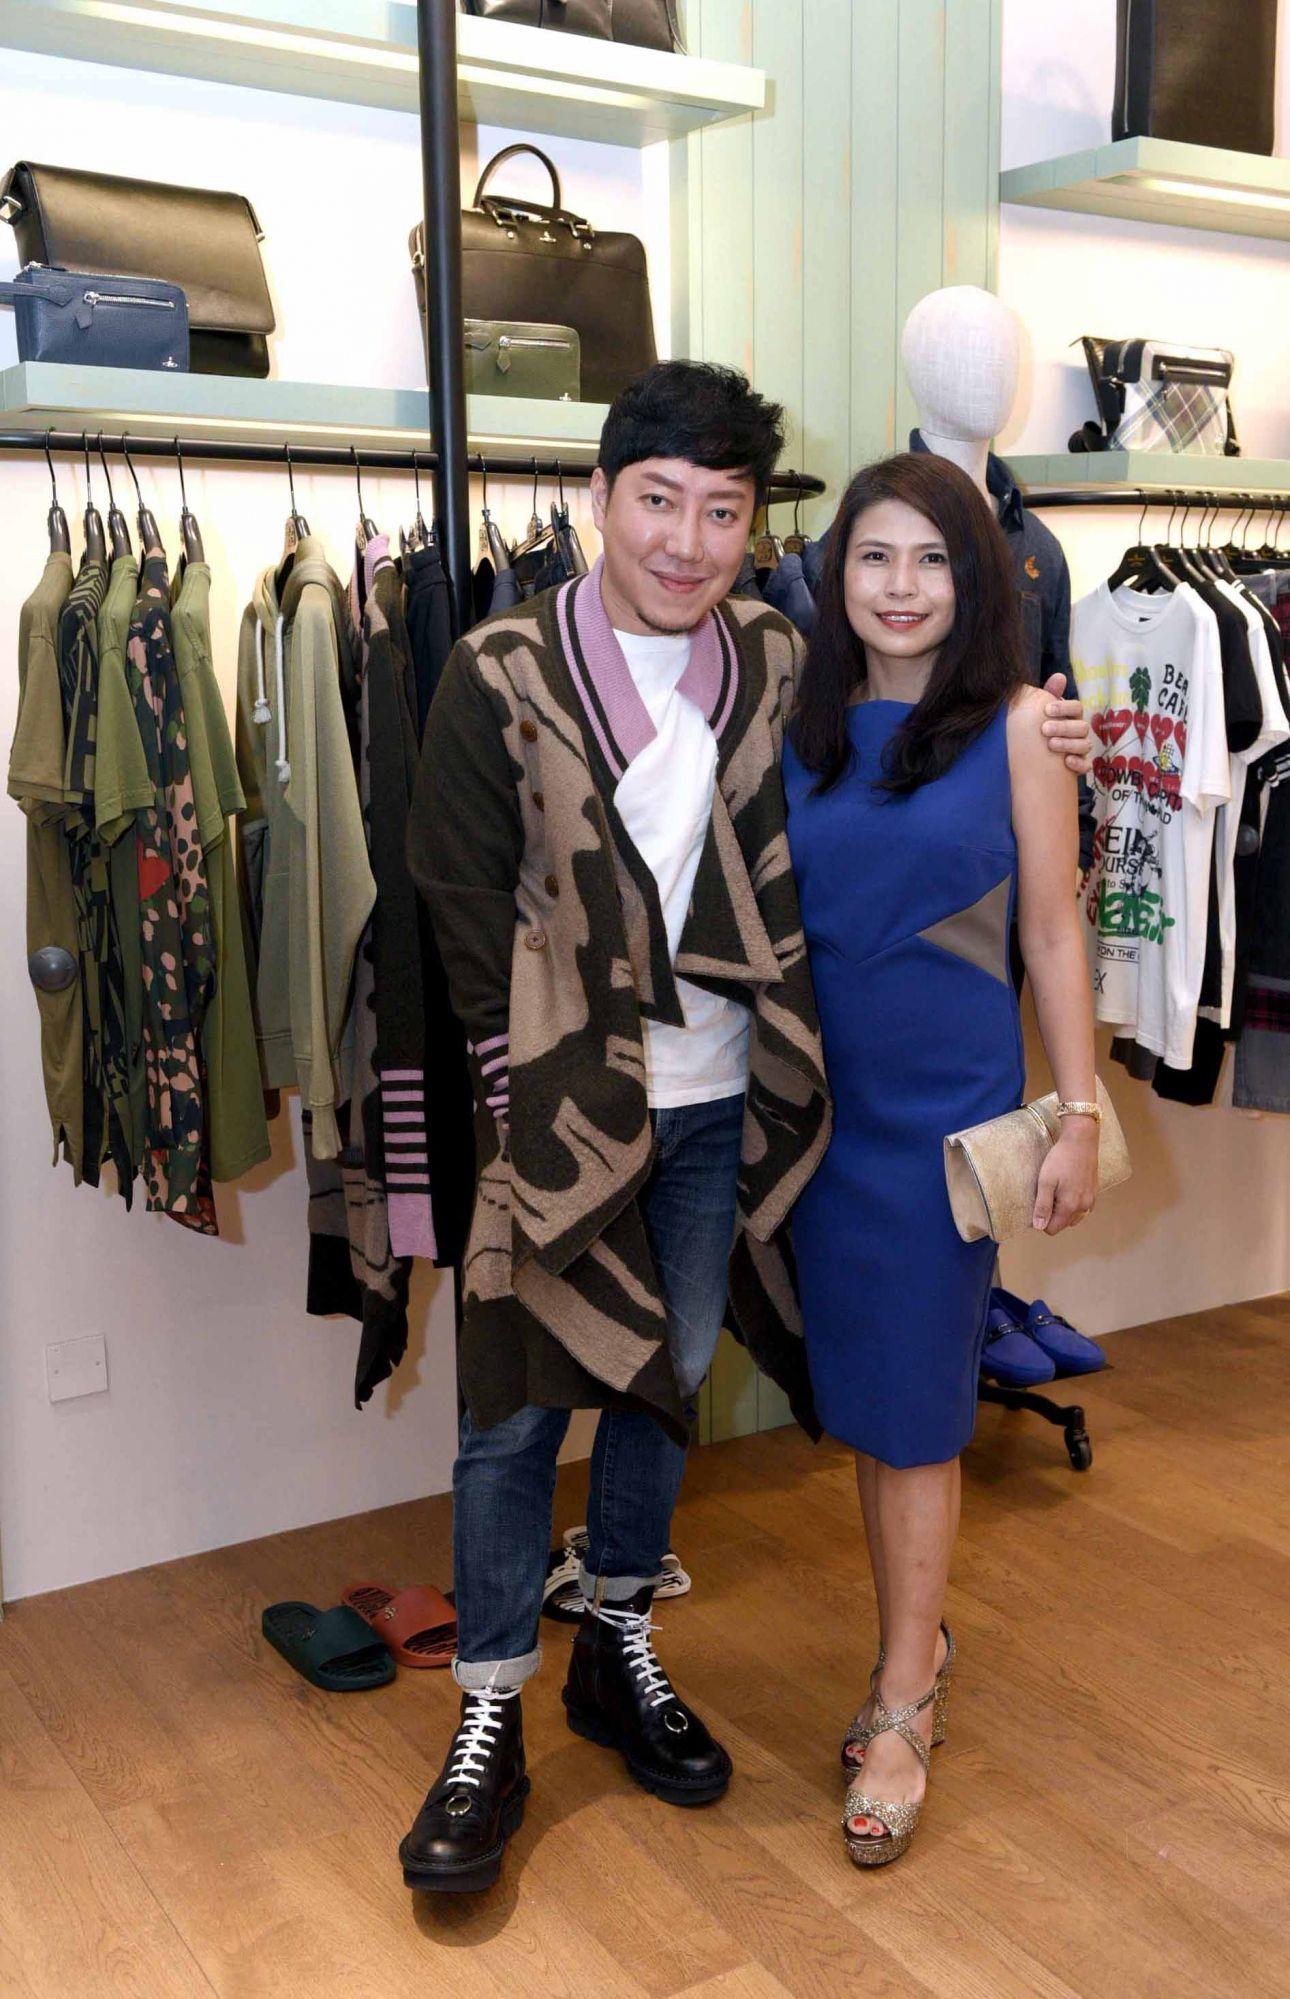 Desmond Lim, Marilyn Lum